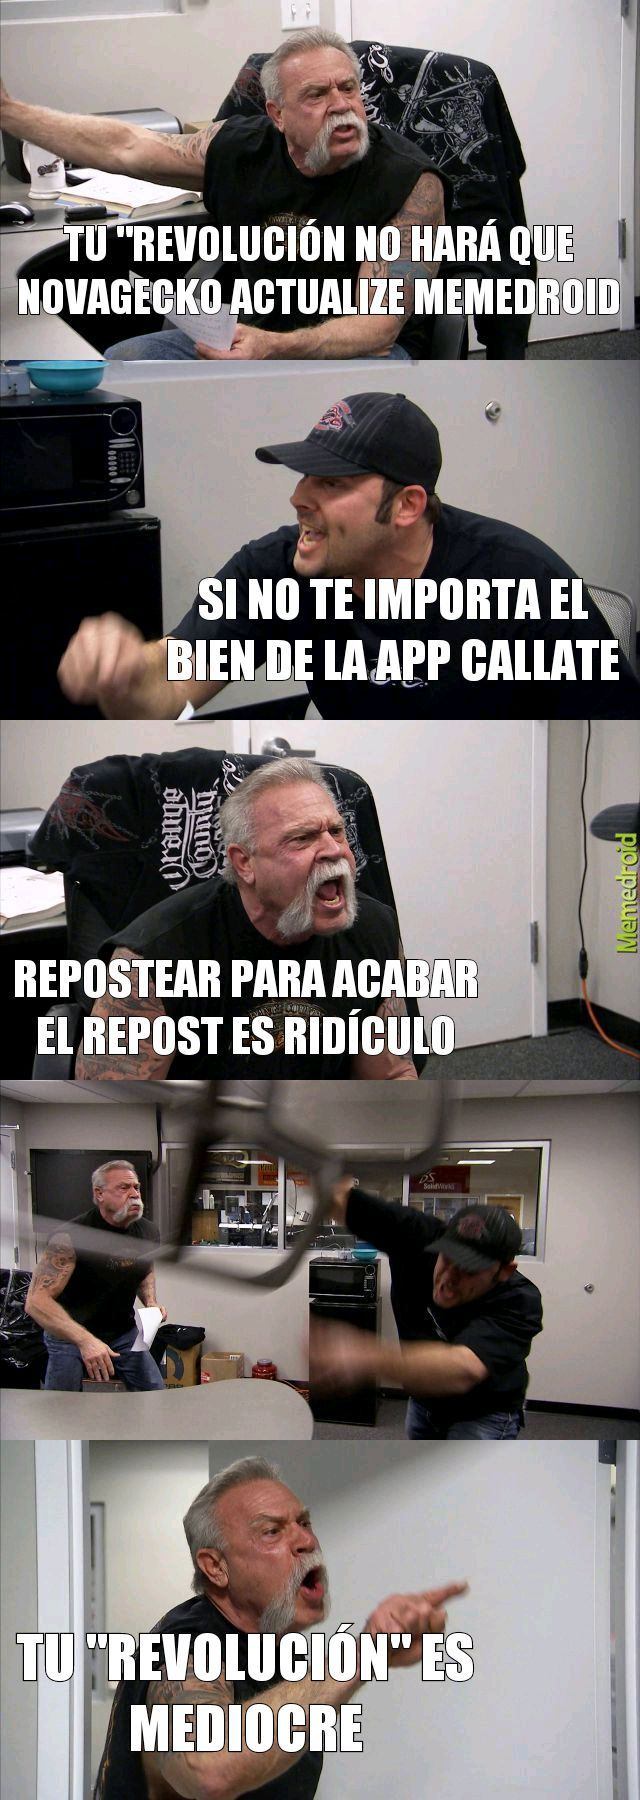 AHSHWHDDHRK - meme